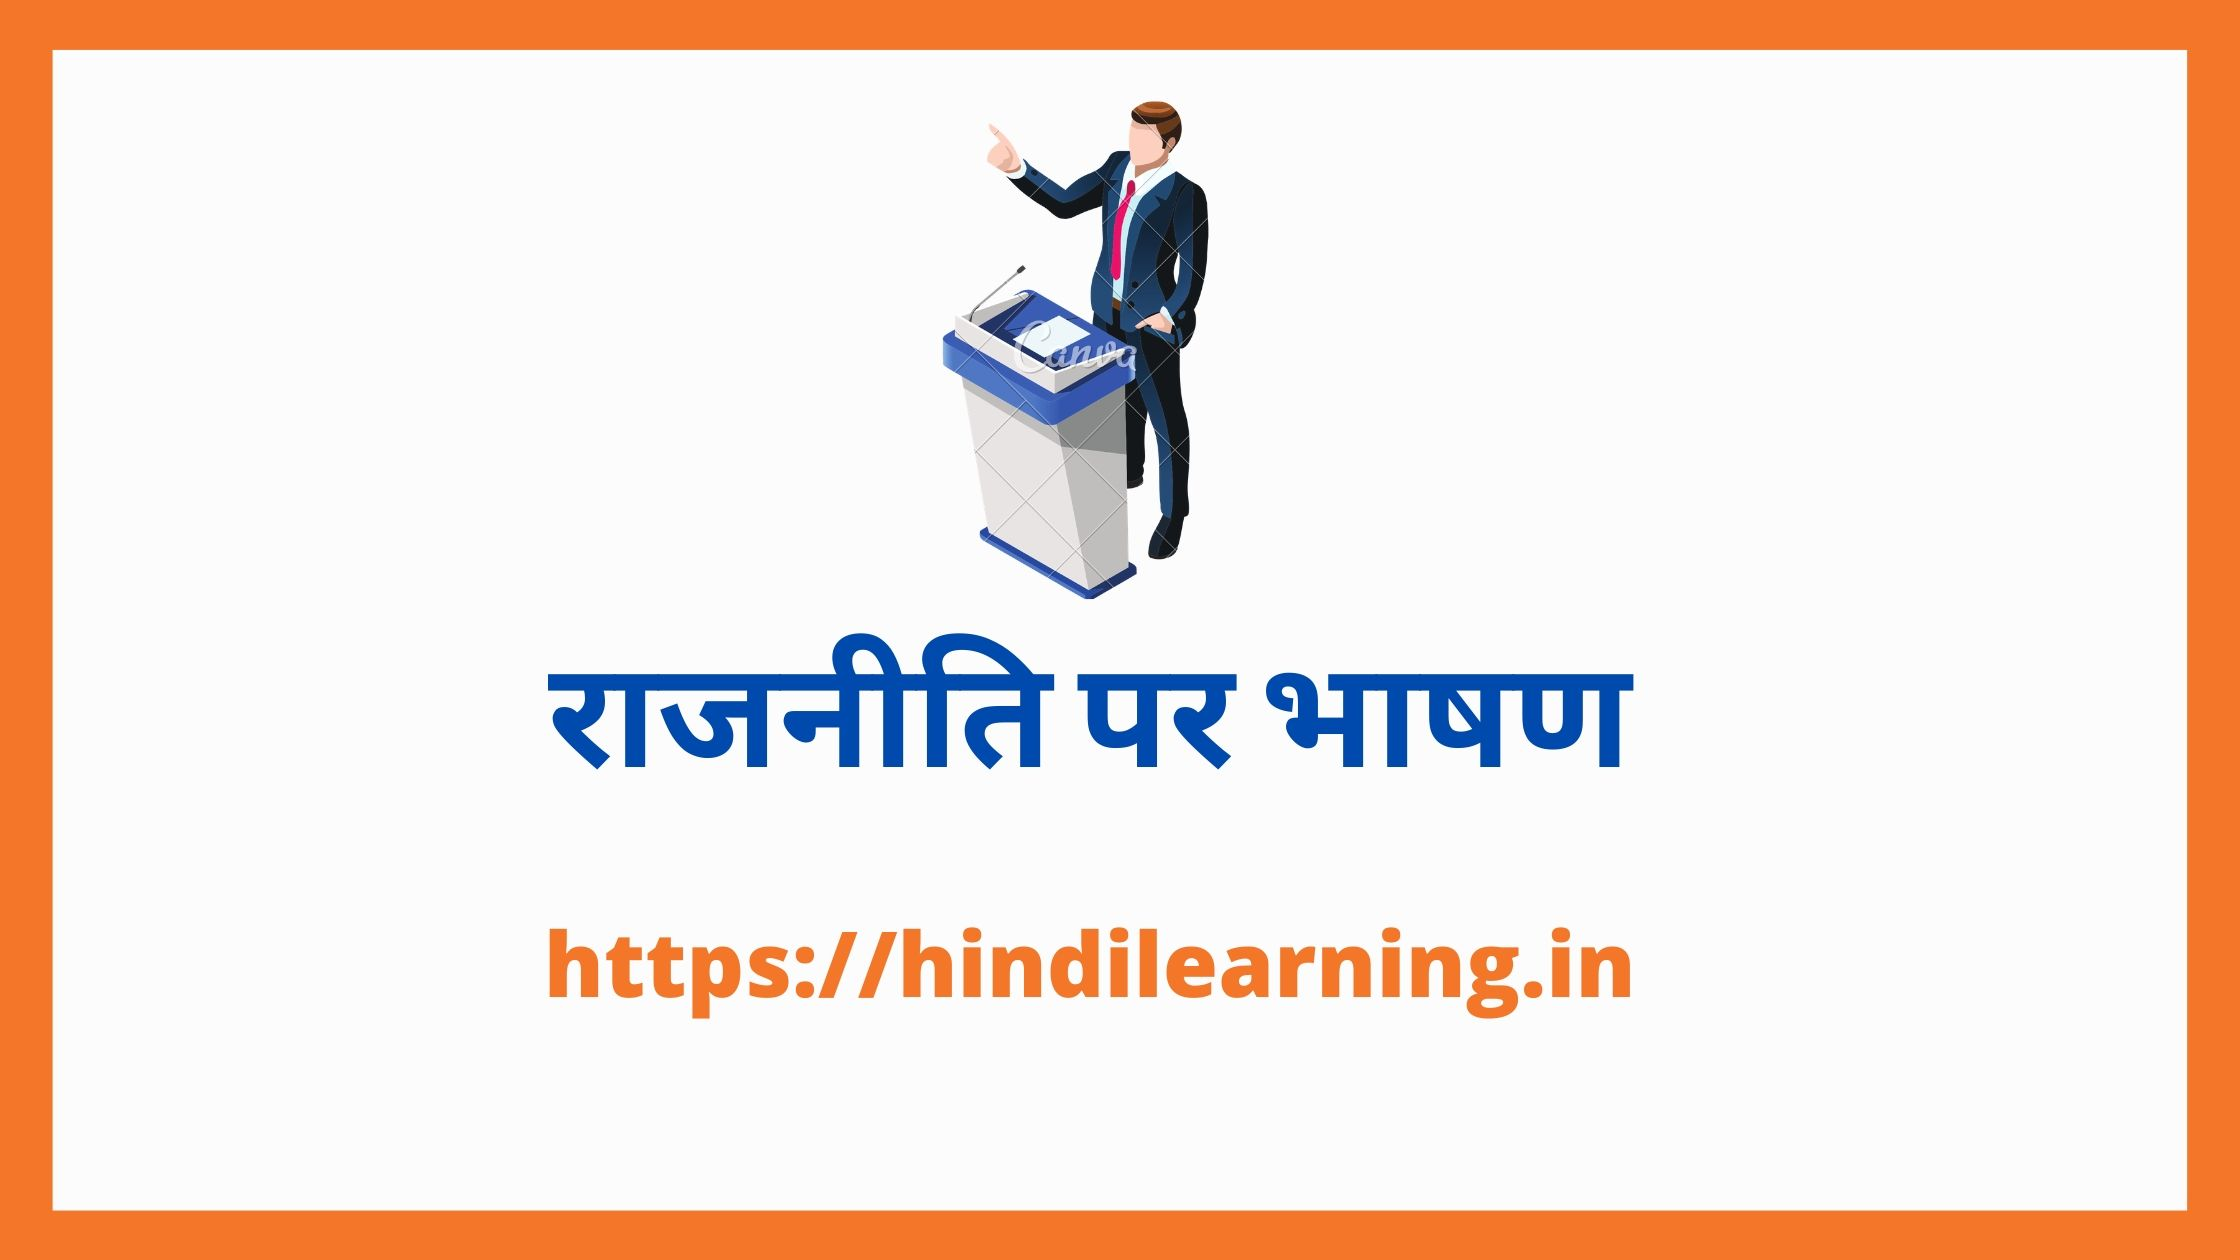 राजनीति पर भाषण - Speech on Politics in Hindi